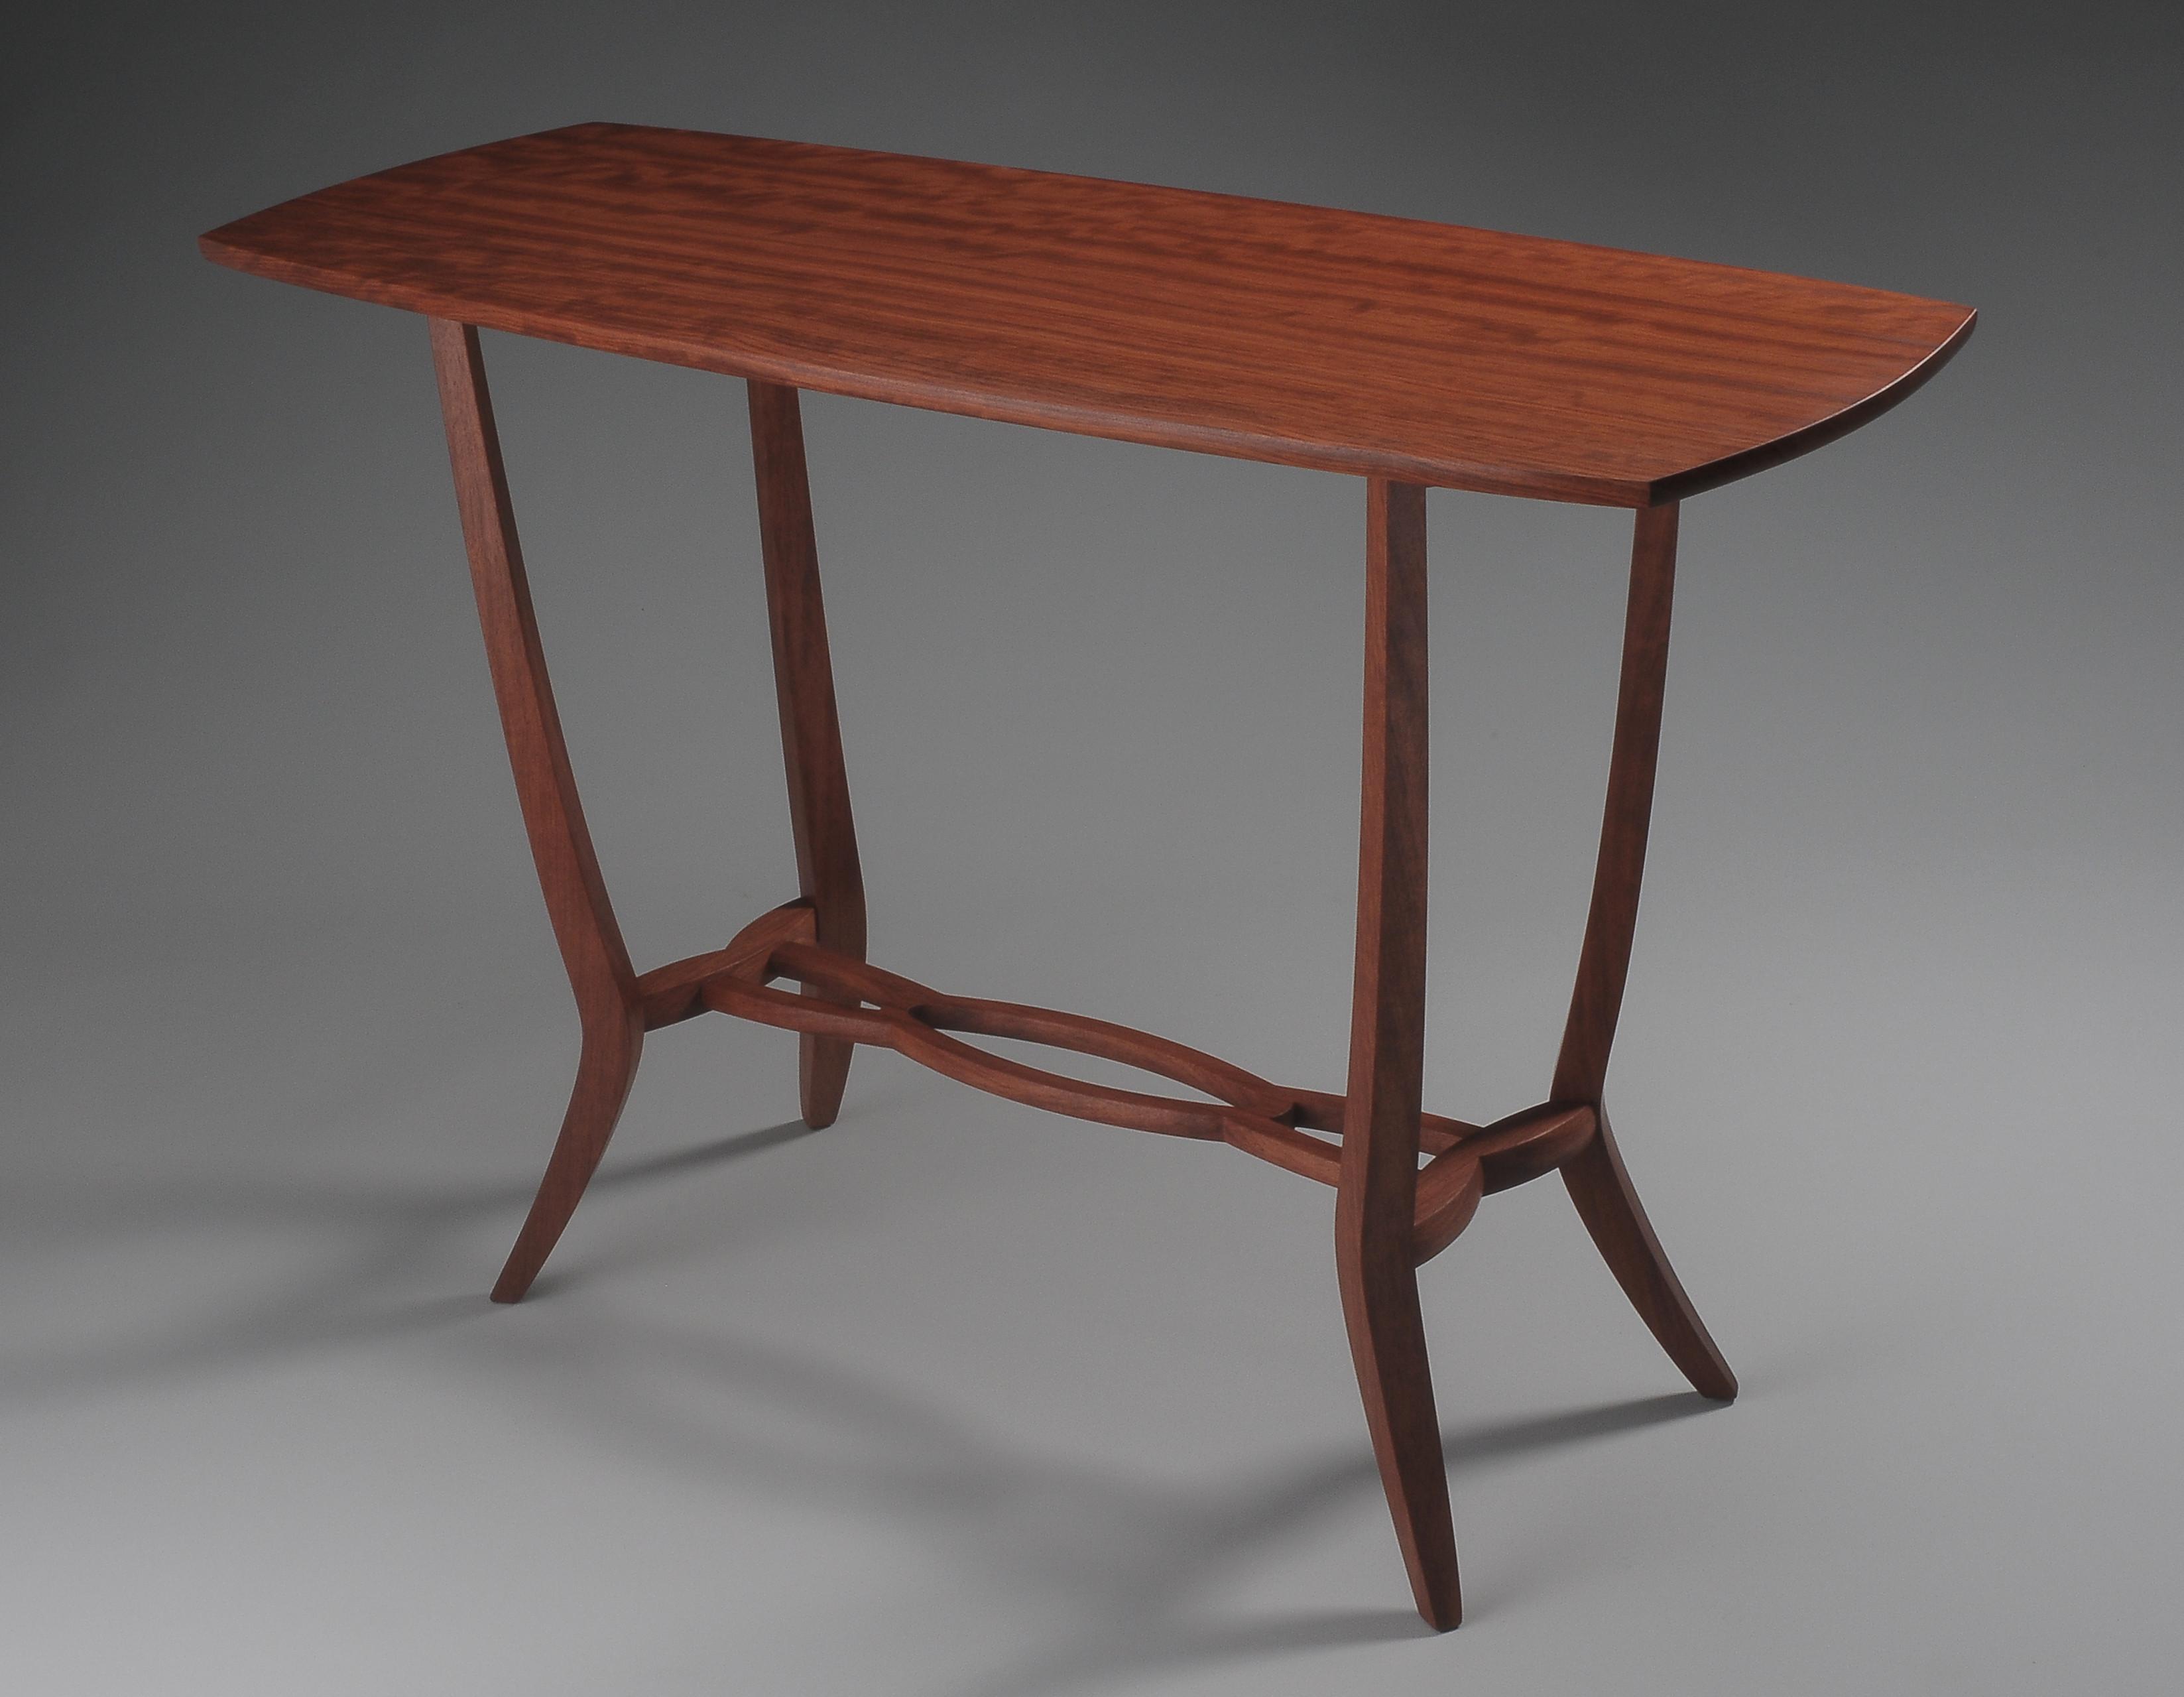 custom handmade hall table by furniture master tim coleman